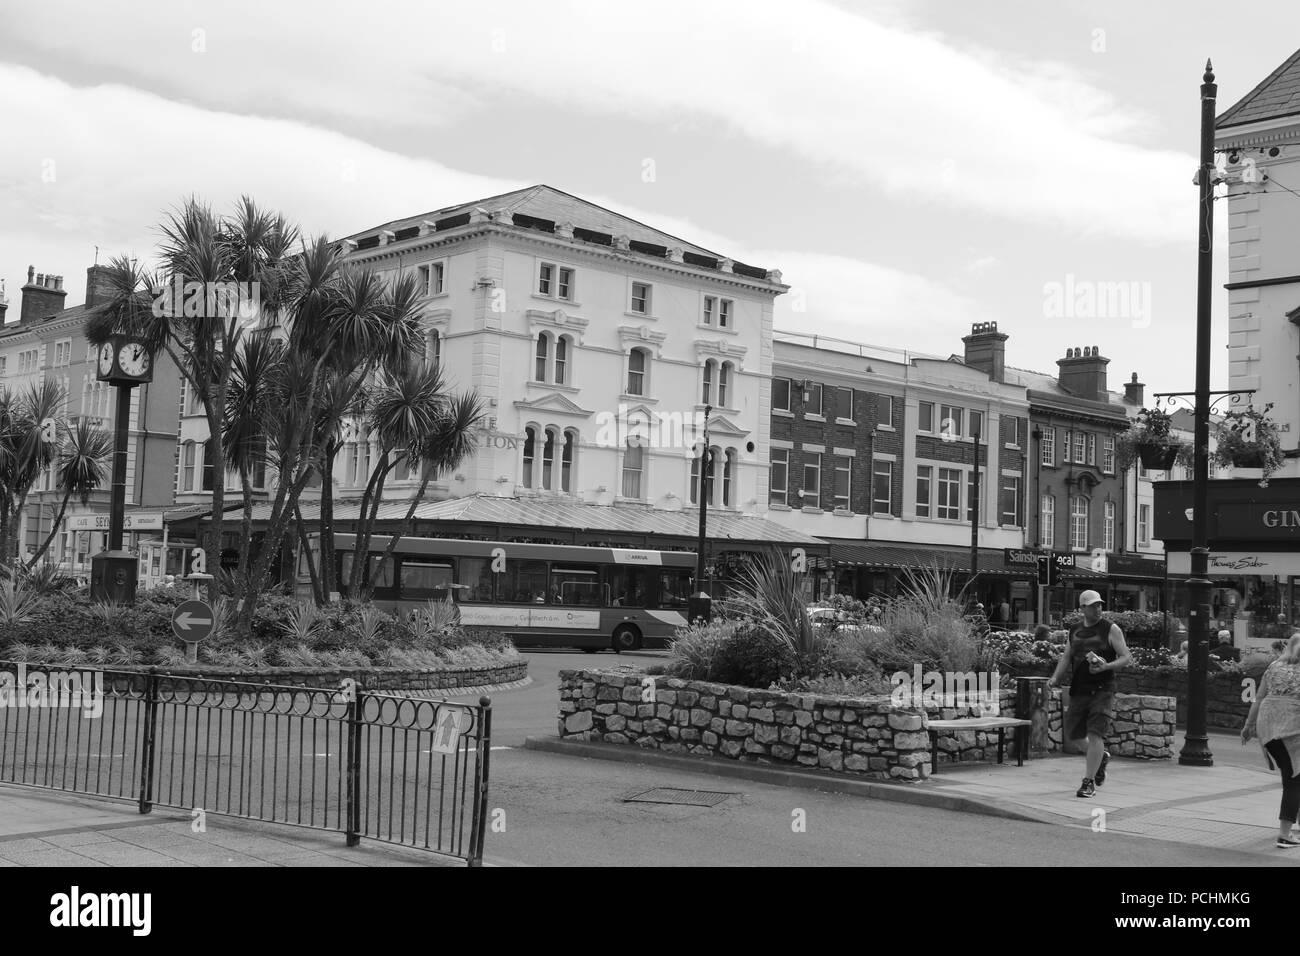 Llandudno, Wales UK - Stock Image